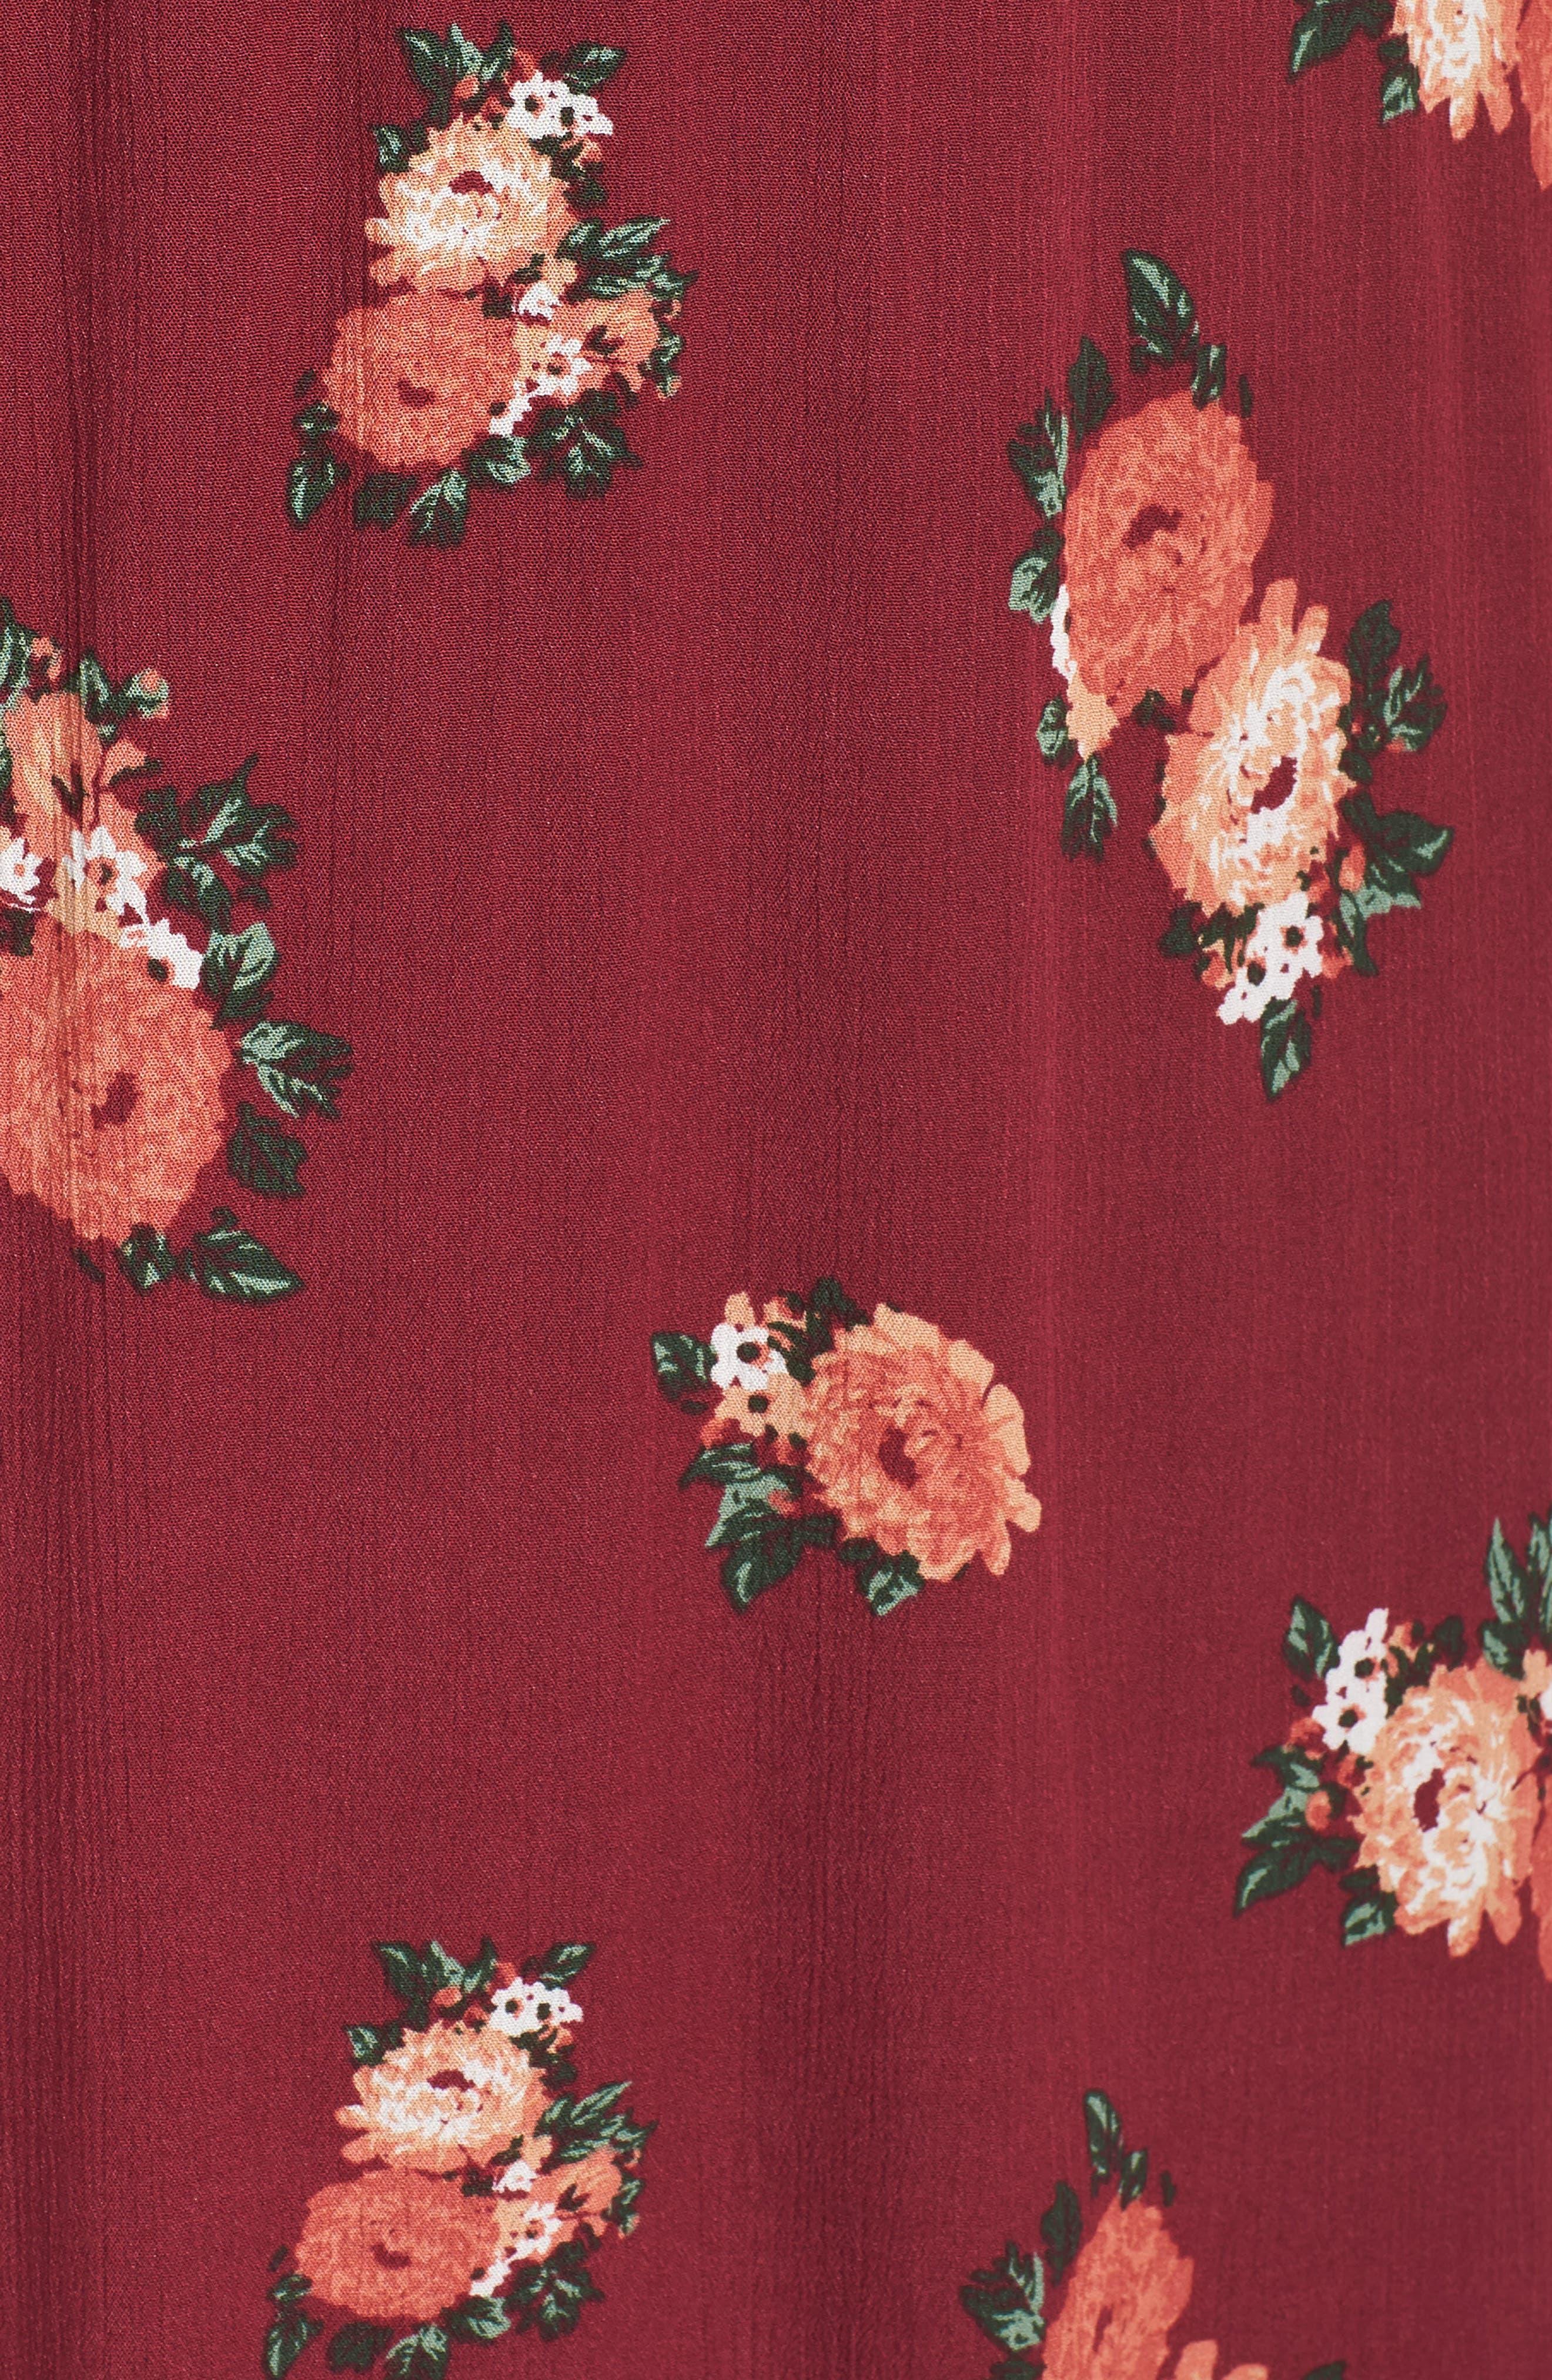 Blouson Midi Dress,                             Alternate thumbnail 6, color,                             RED RUMBA FLORAL